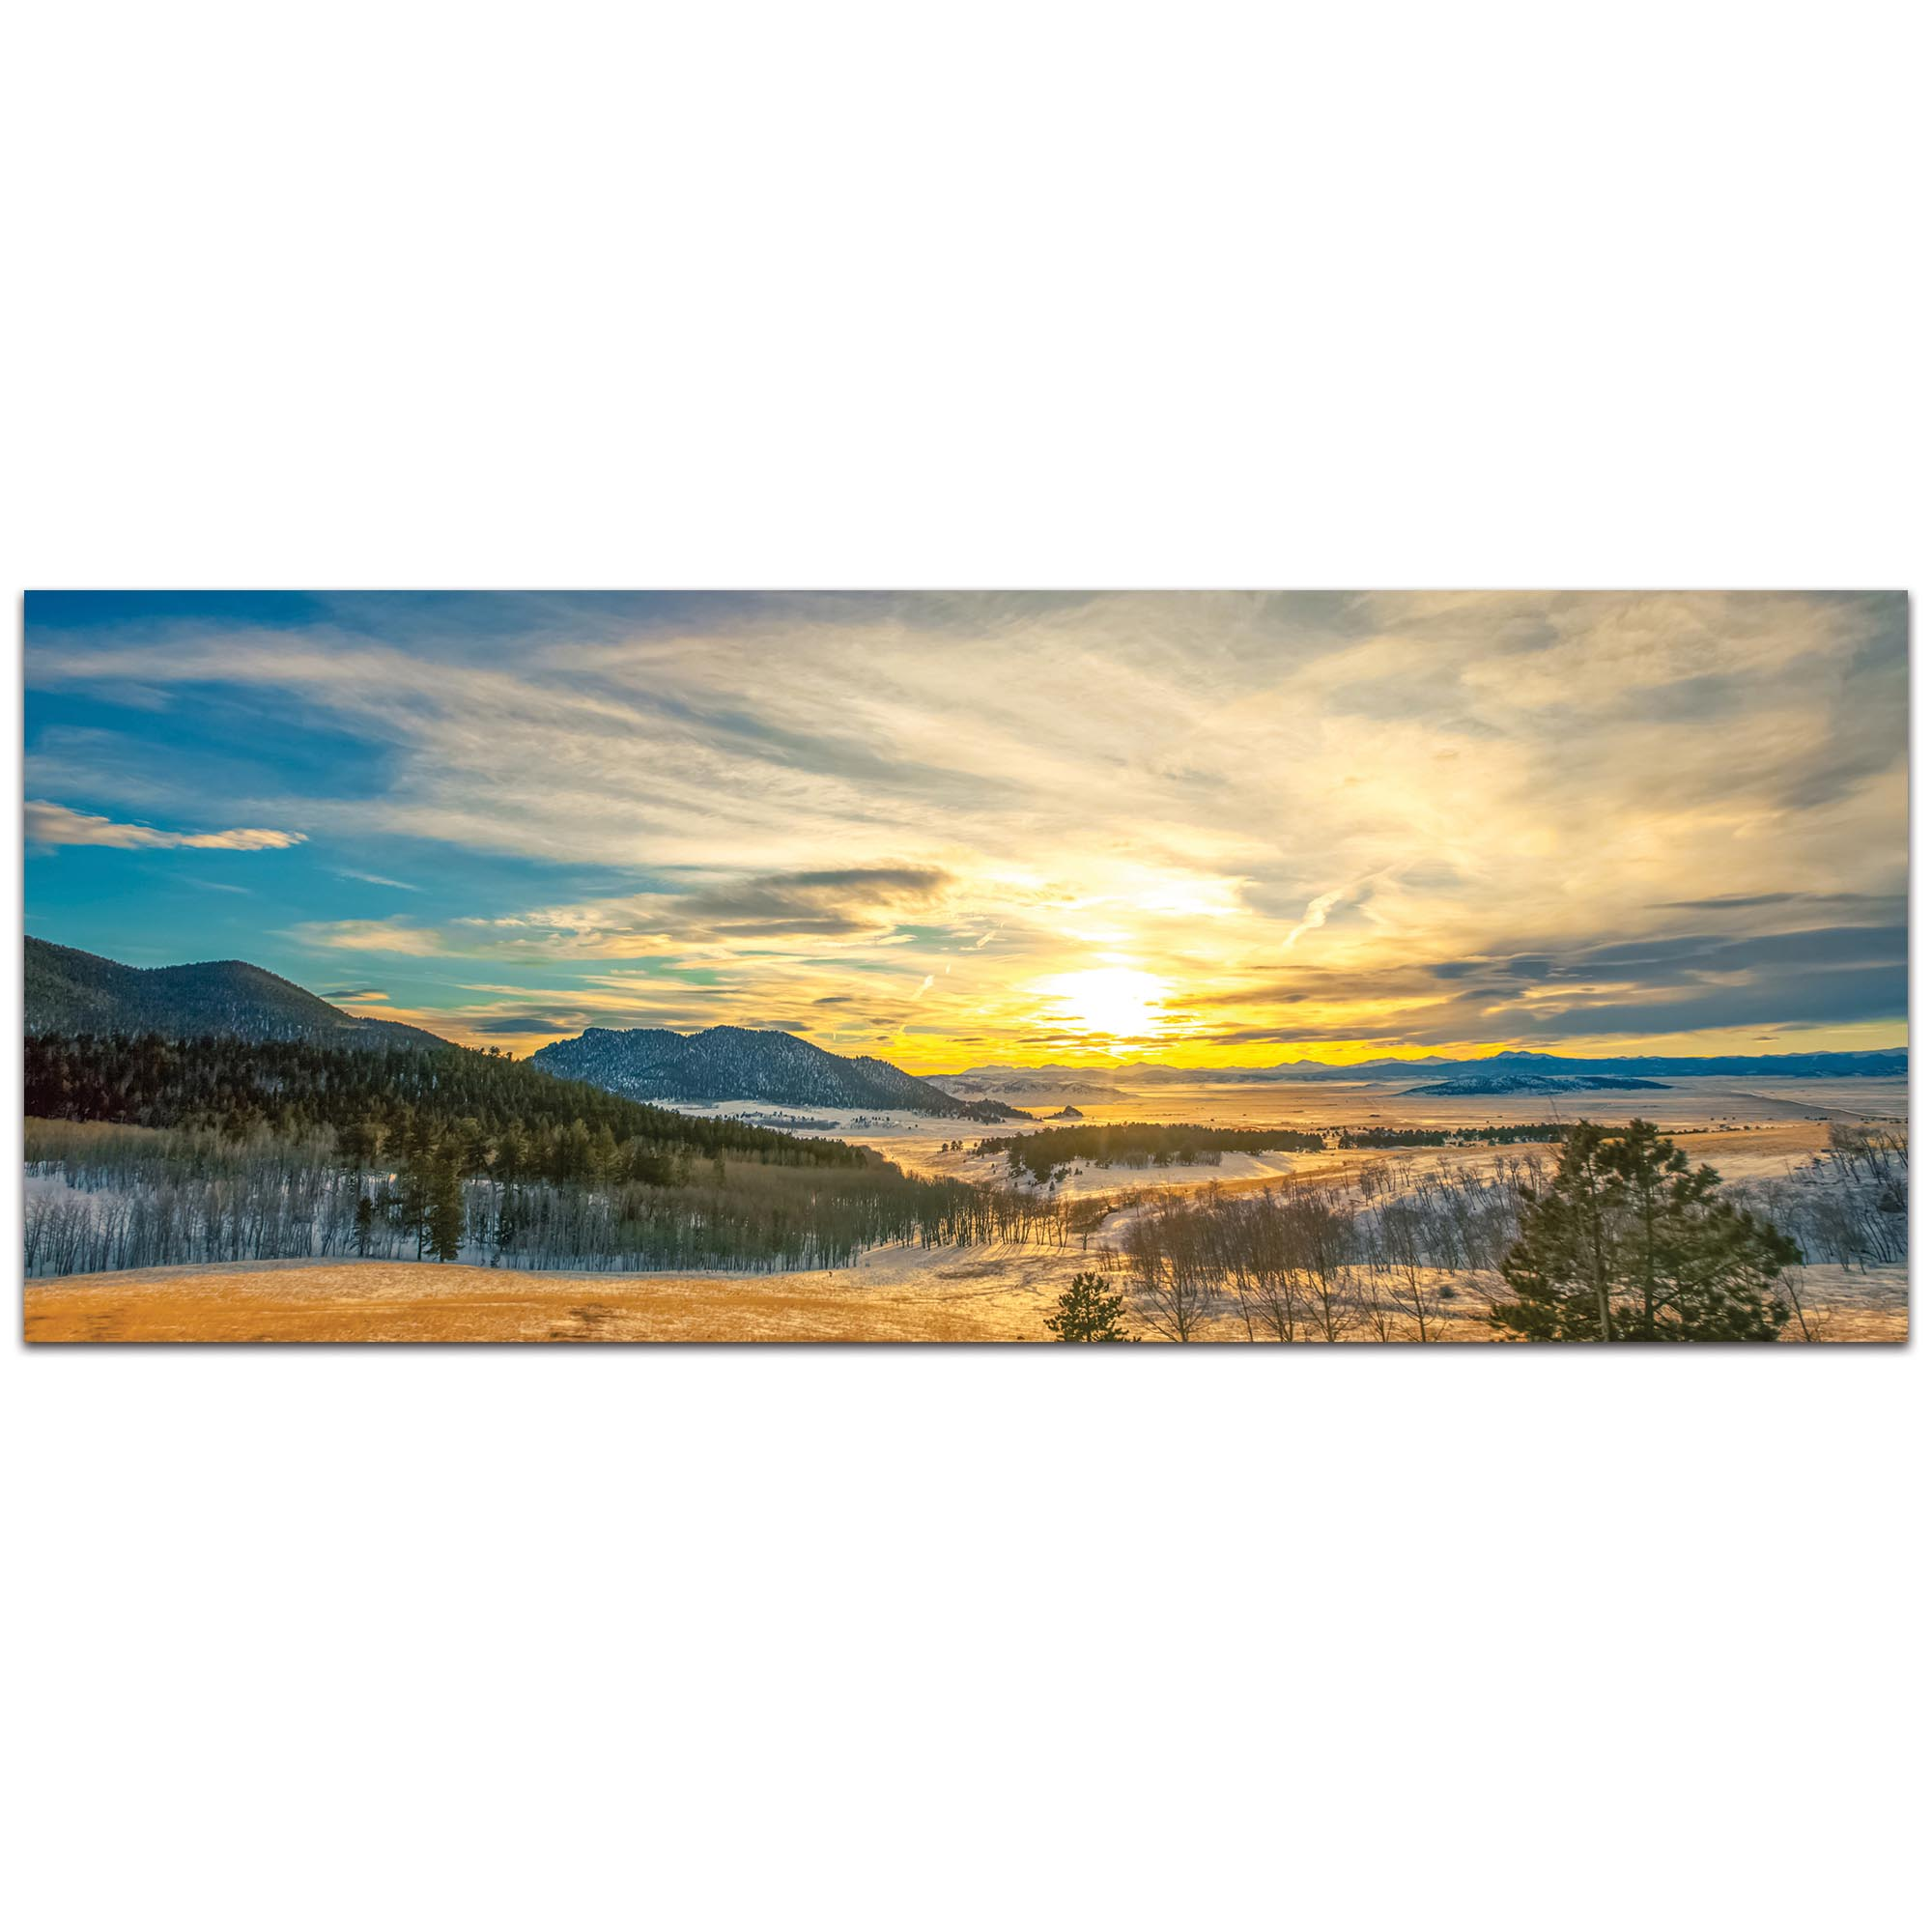 Landscape Photography 'Brisk Sunset' - Winter Sunset Art on Metal or Plexiglass